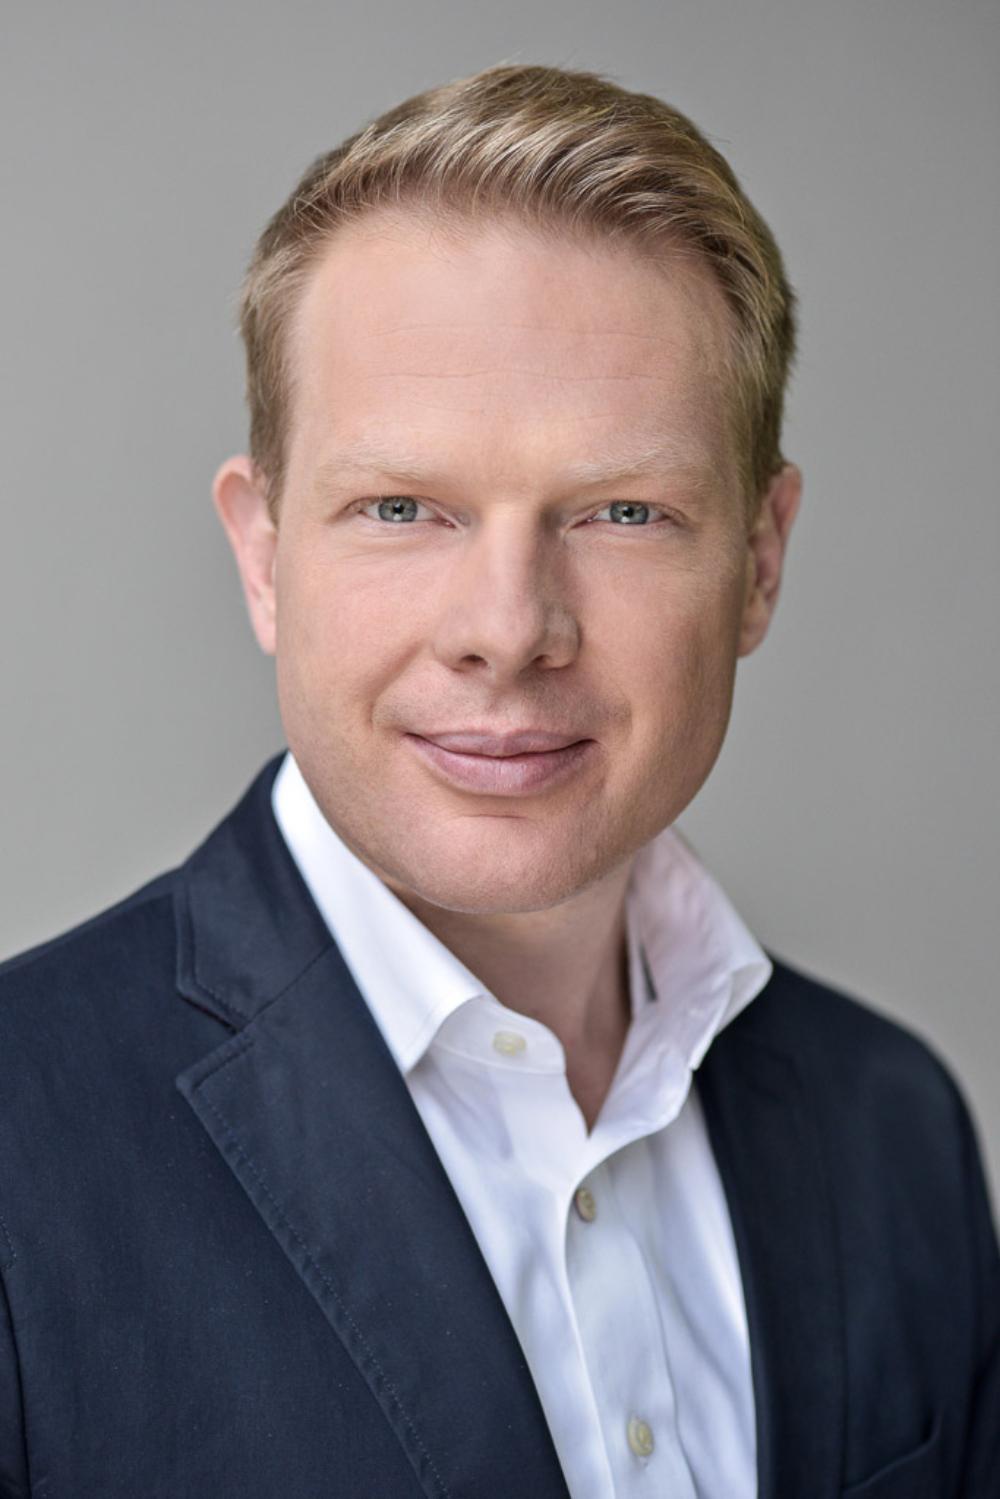 Patrik Schober 1 Patrik Schober otvara Forum IZAZOV 2021!